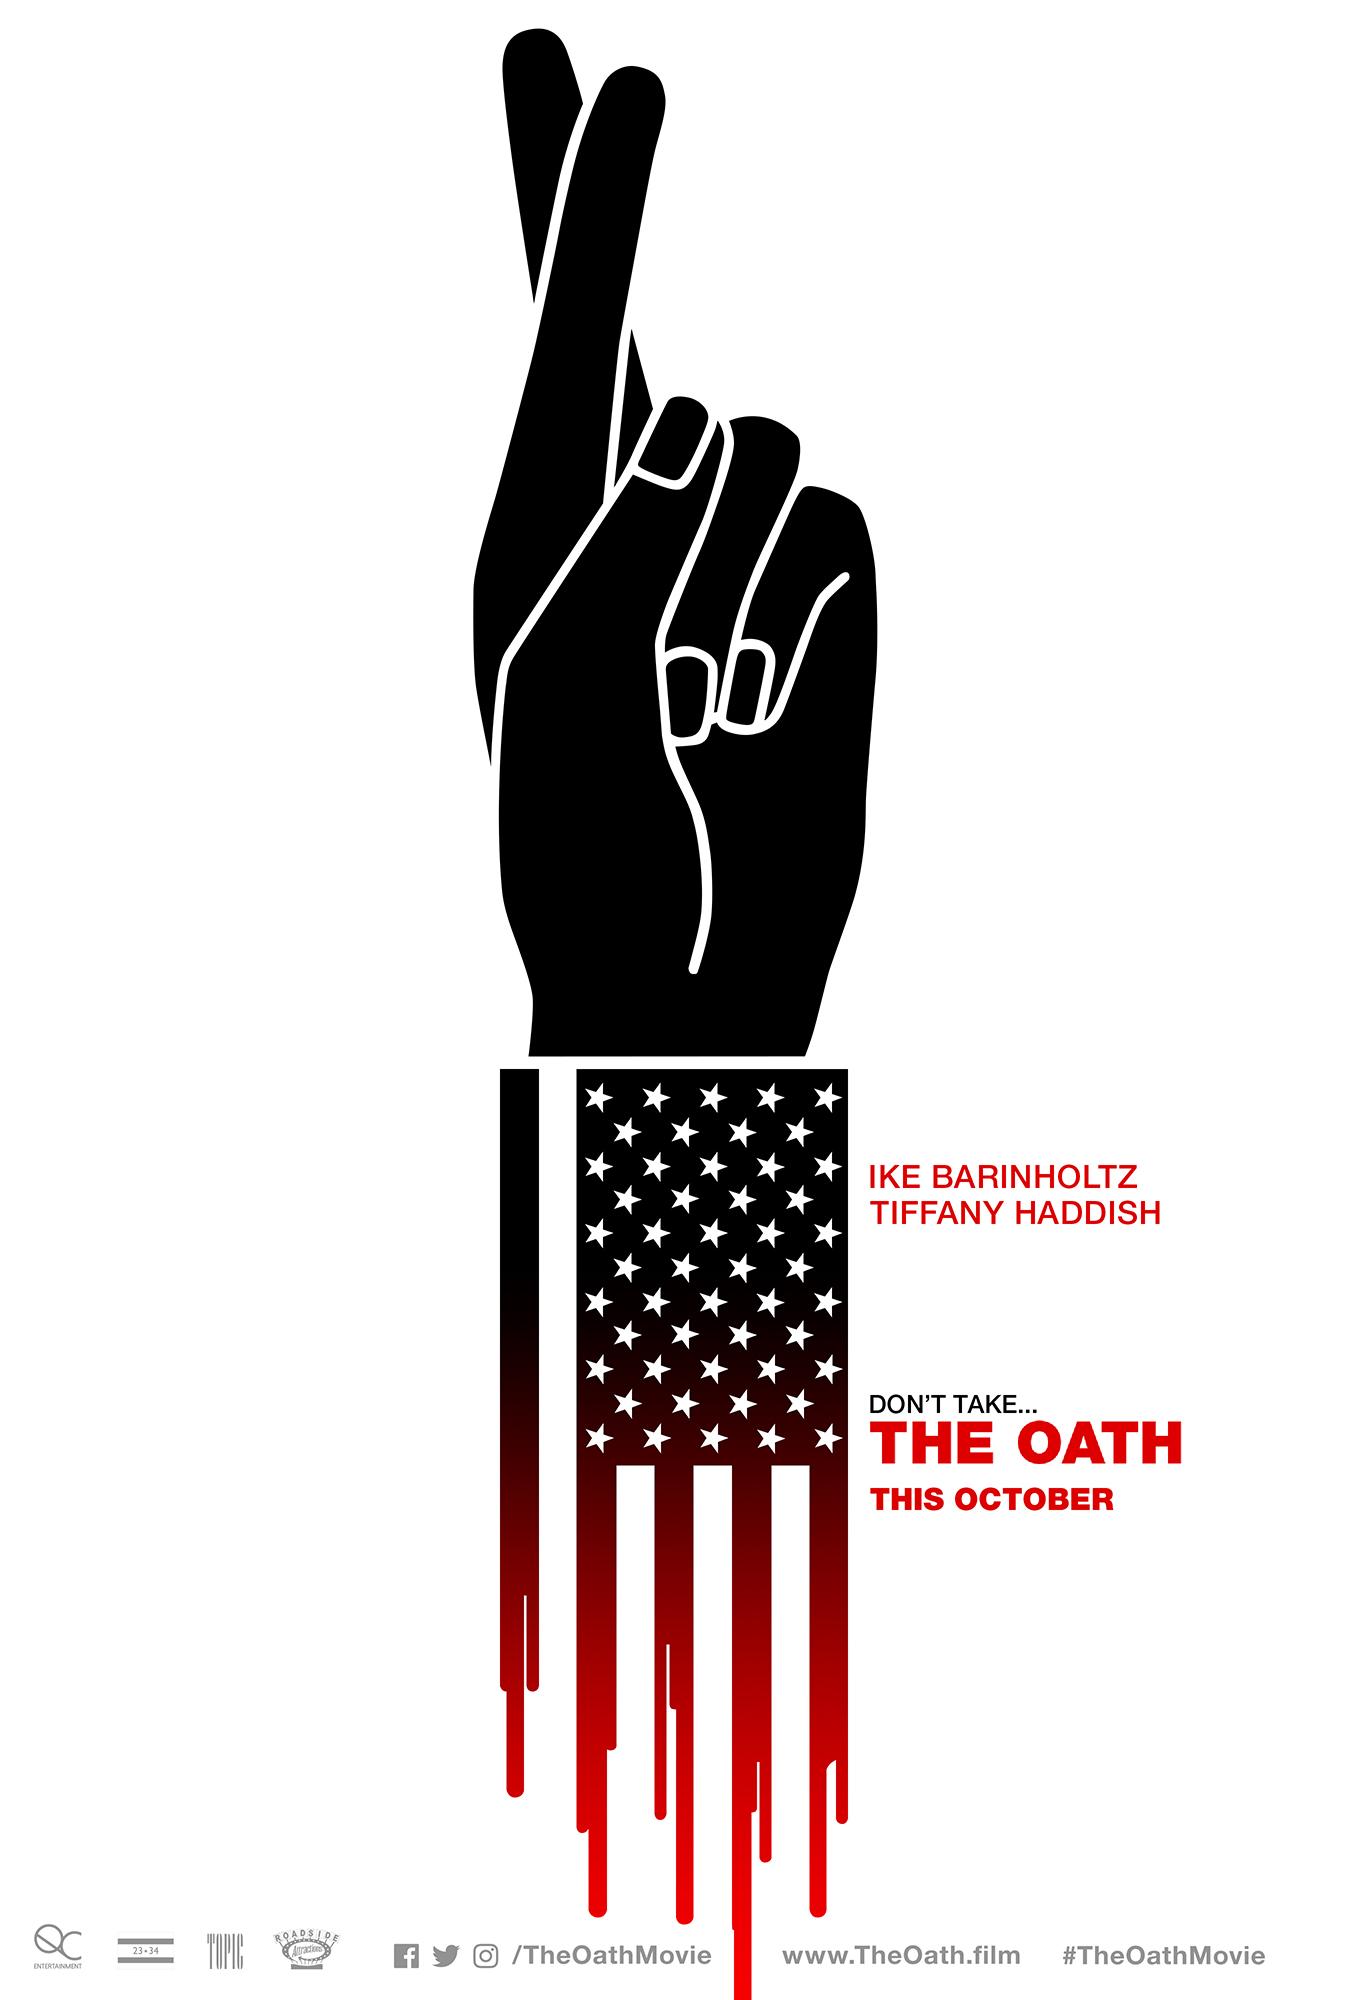 TheOath_Online_1Sht_04_100dpi.jpg